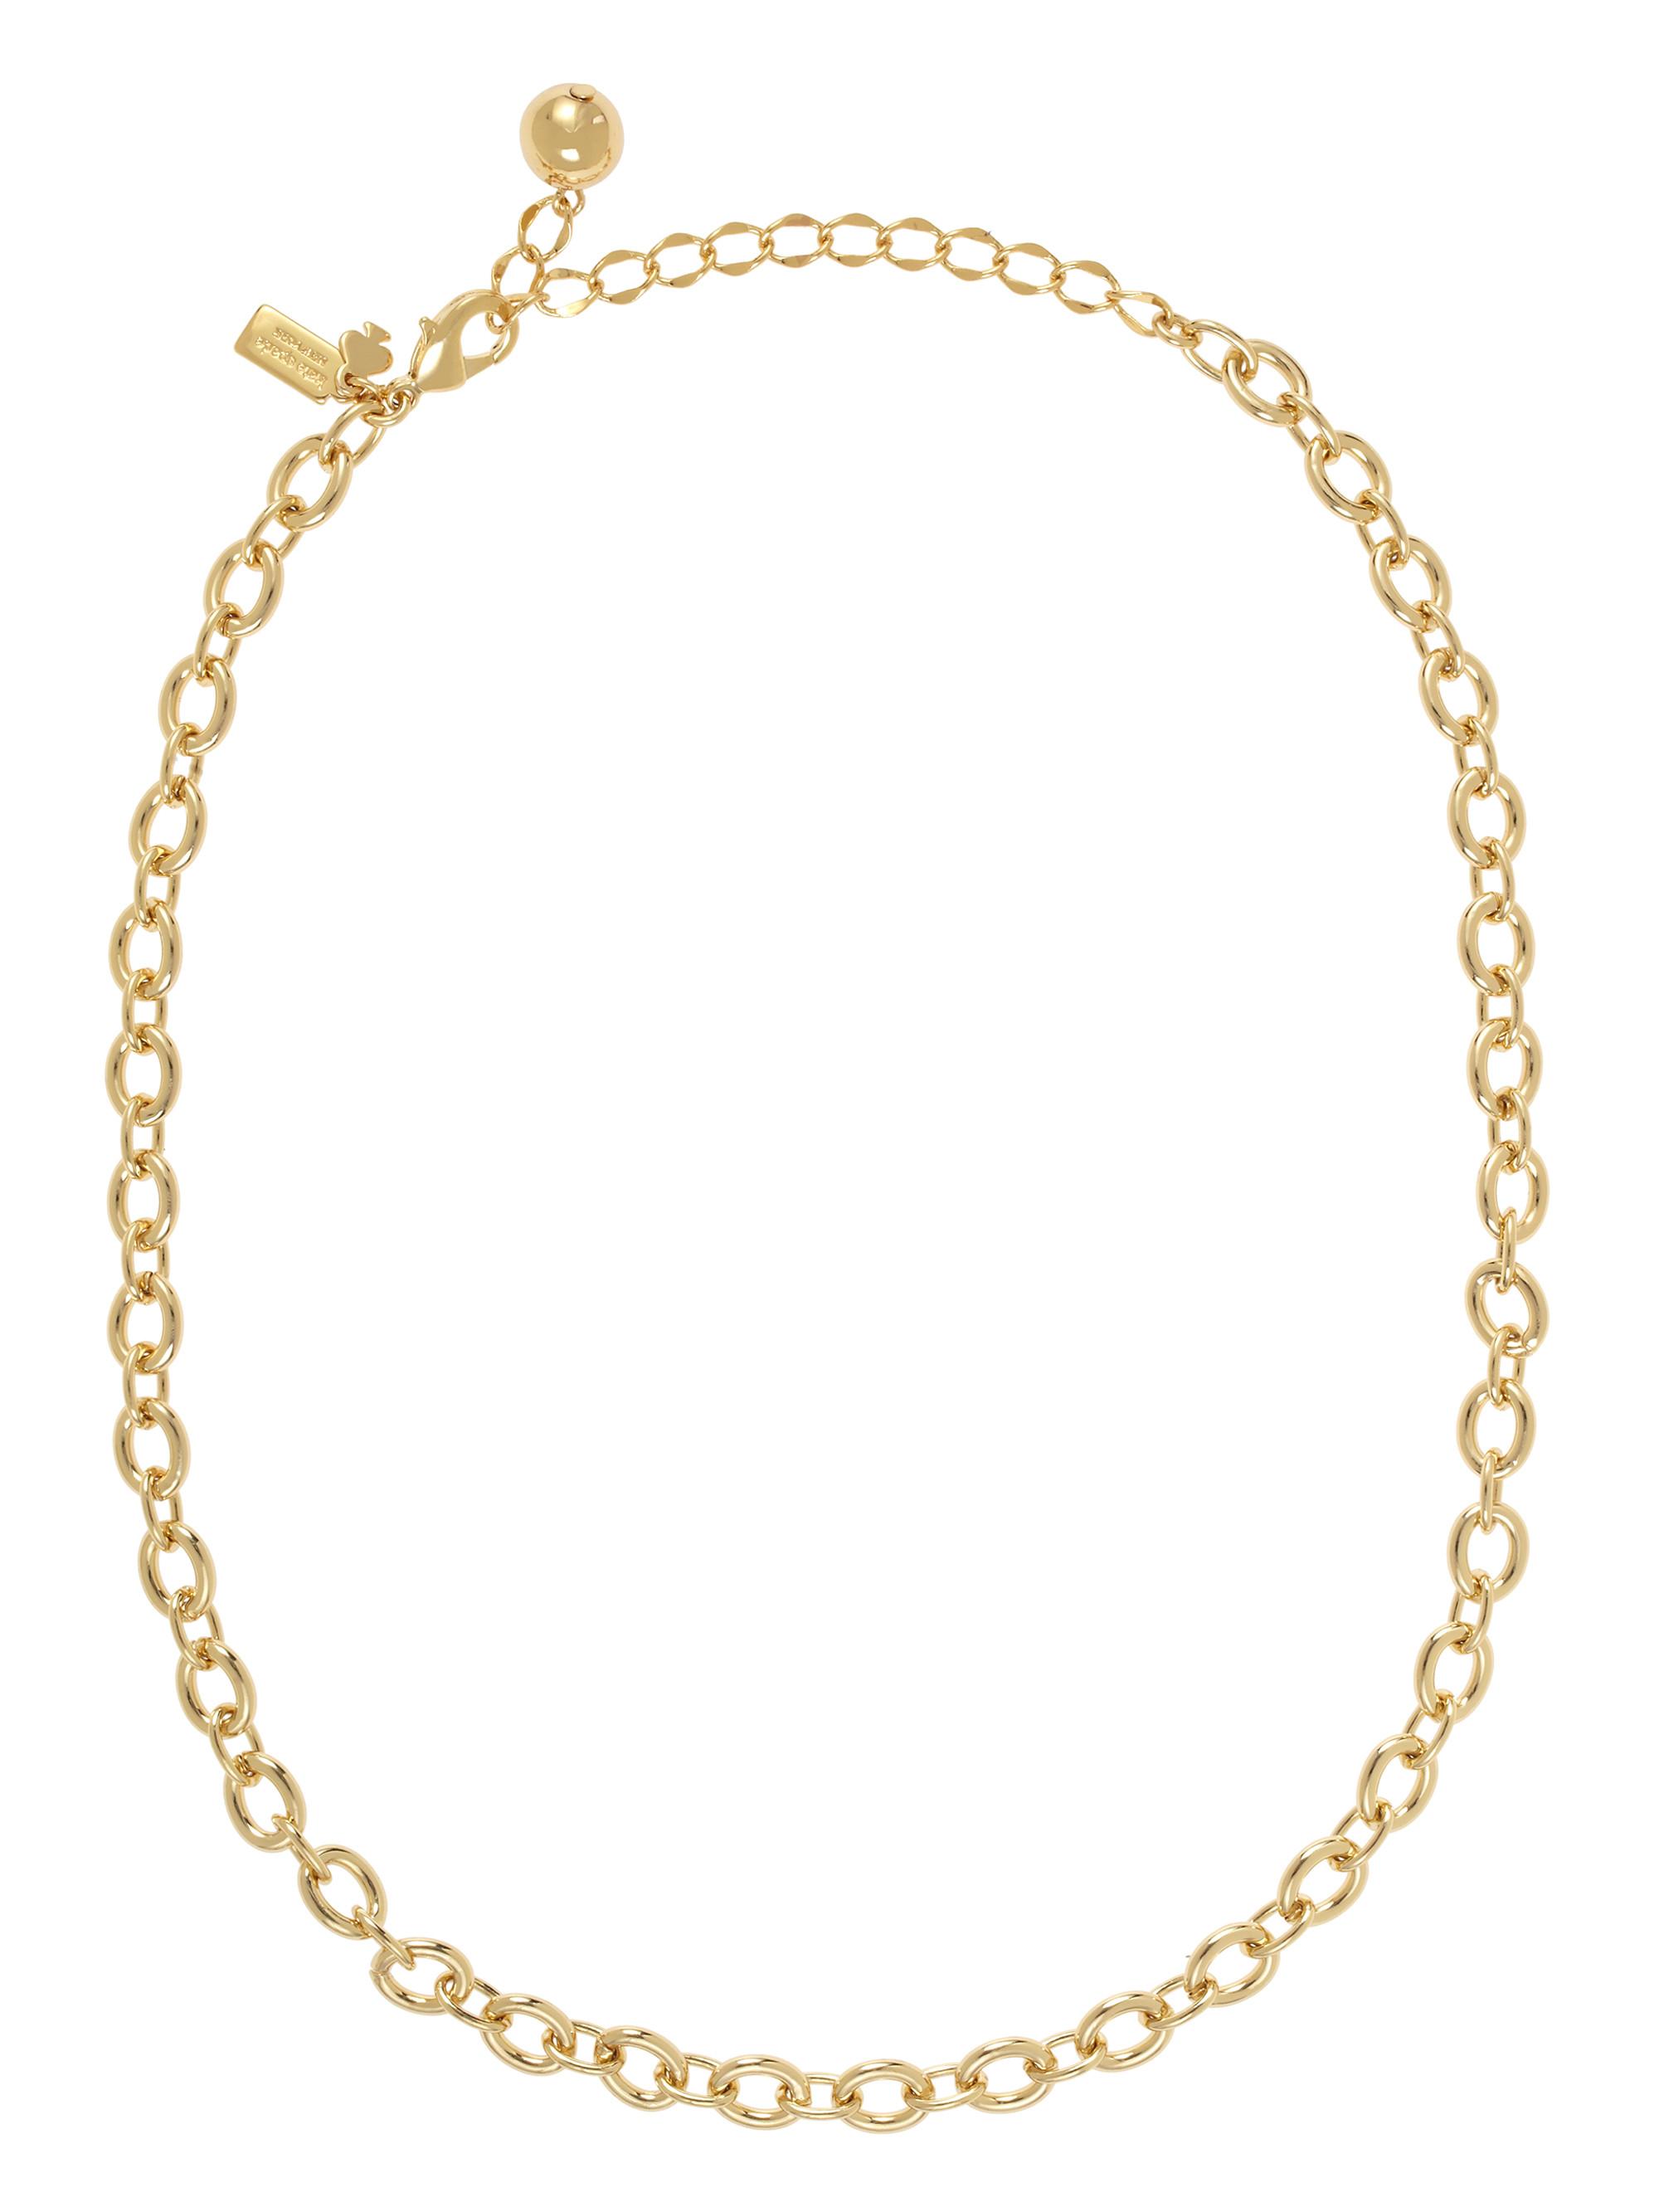 kate spade new york charm link necklace in metallic lyst. Black Bedroom Furniture Sets. Home Design Ideas